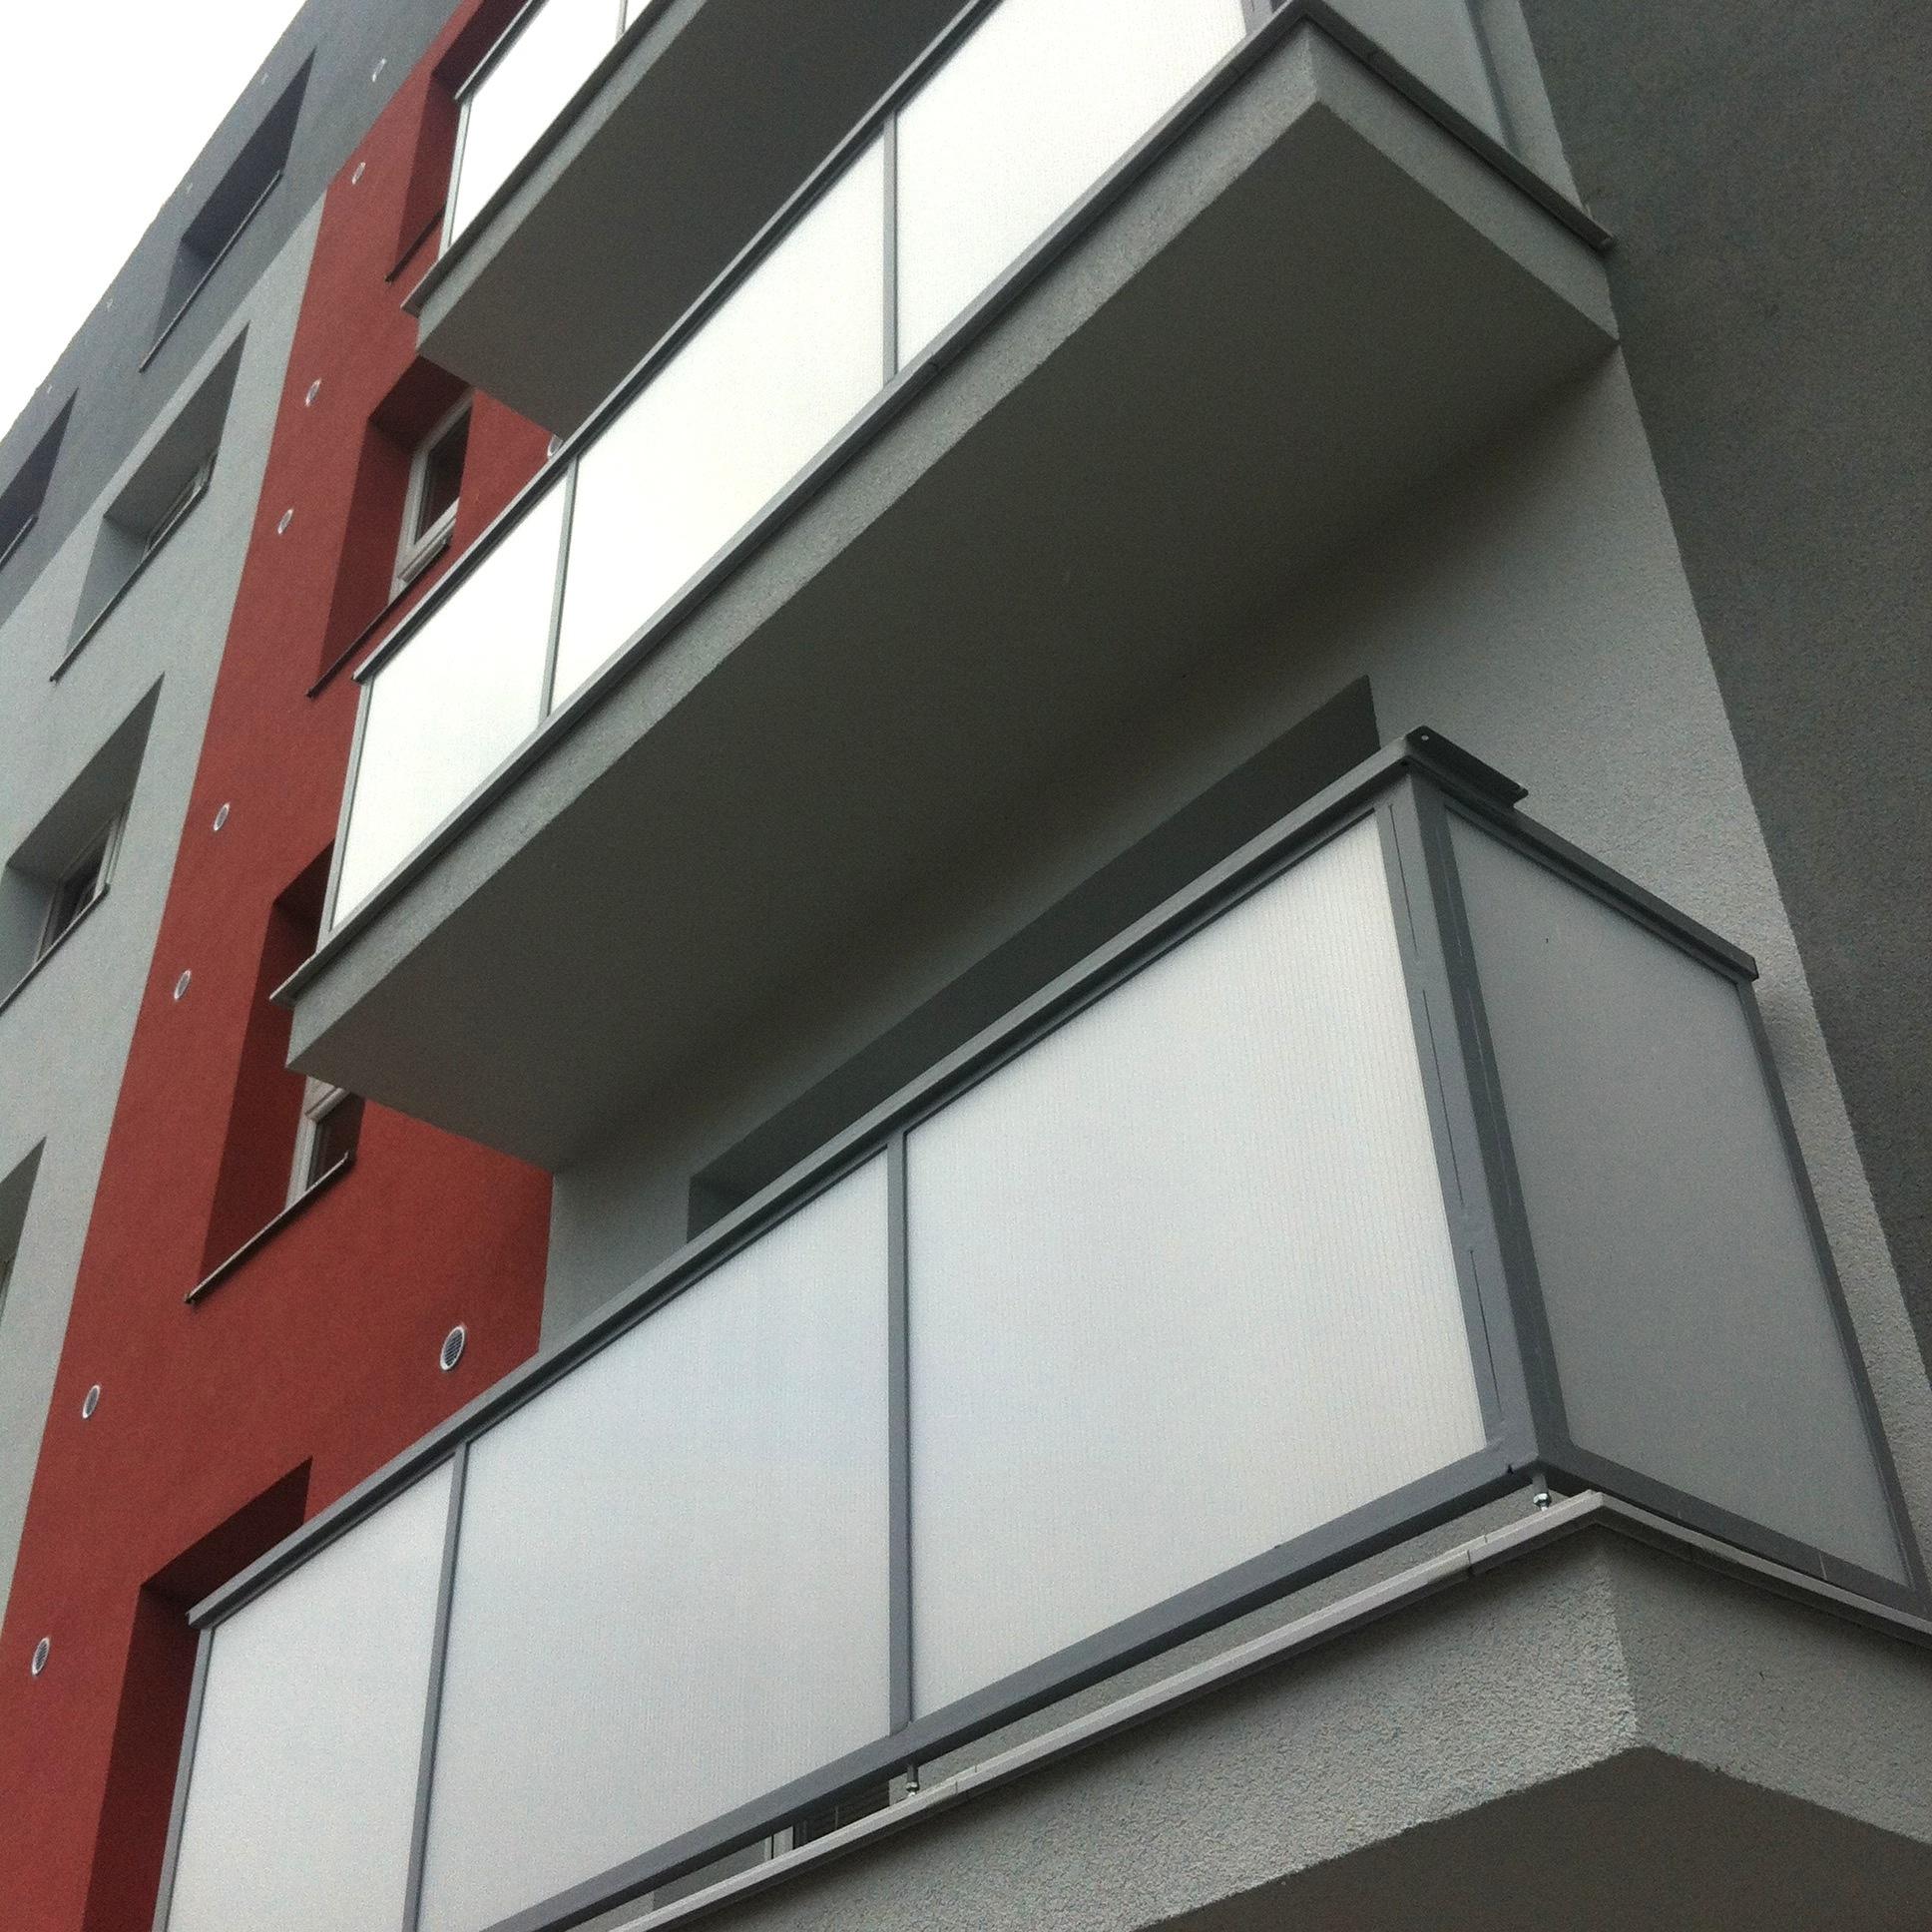 Balkóny na ul. Karola Salvu